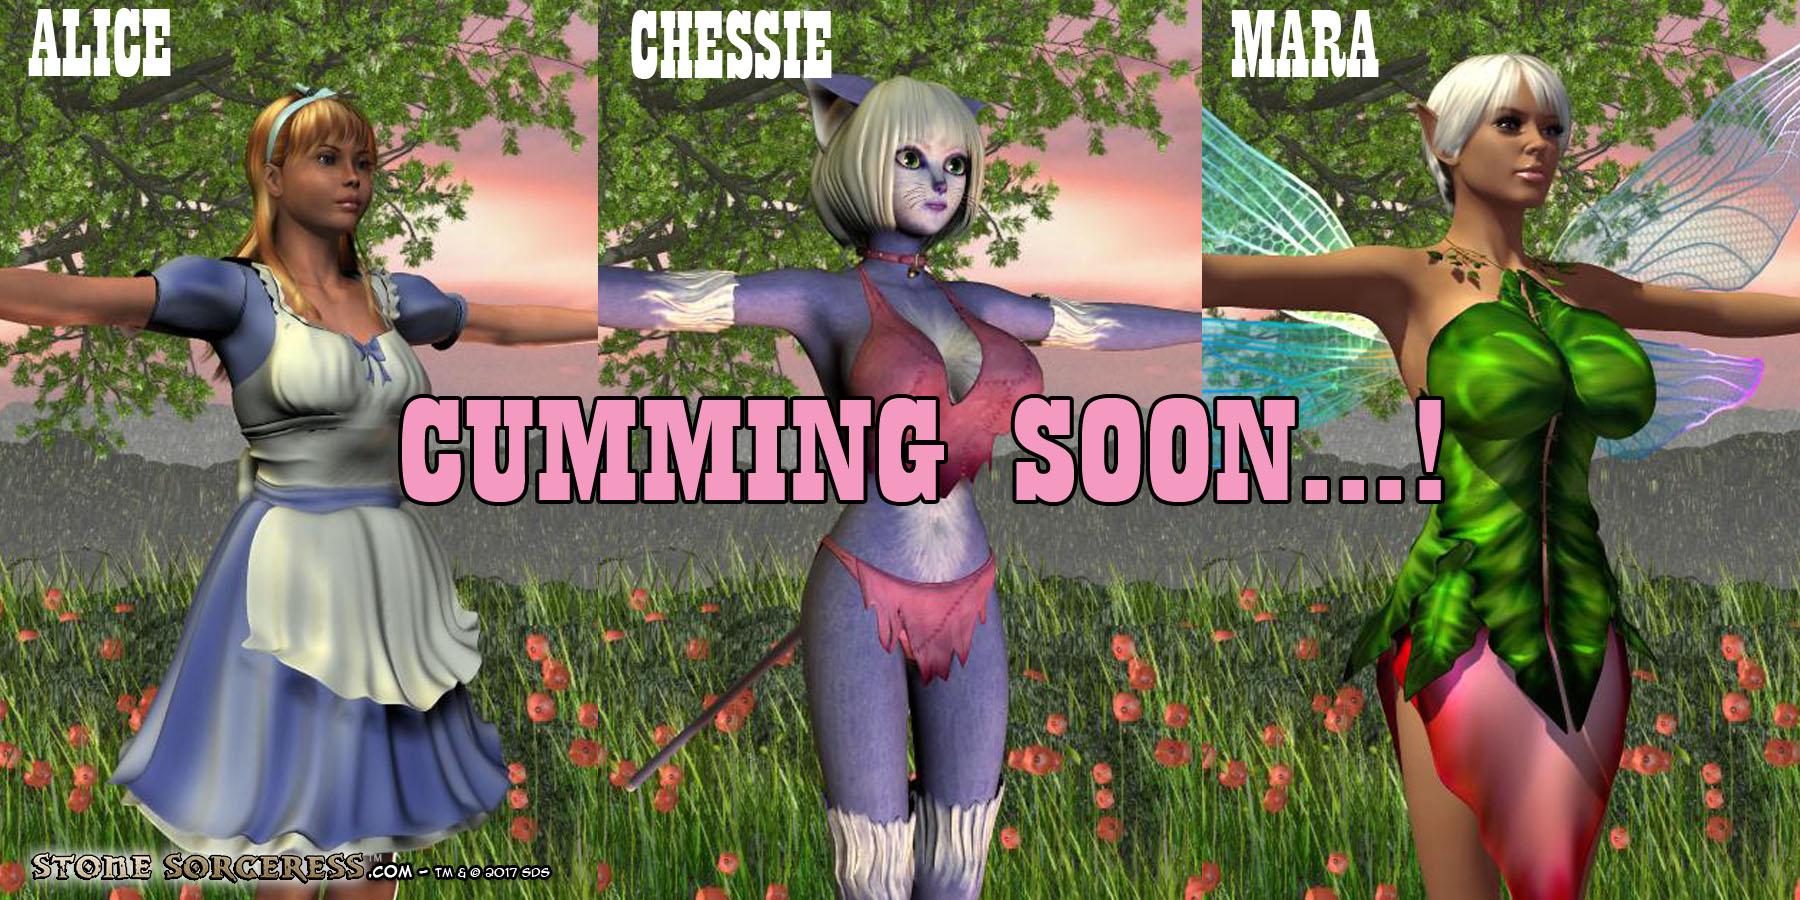 Cumming Soon - Alice - Chessie - Mara